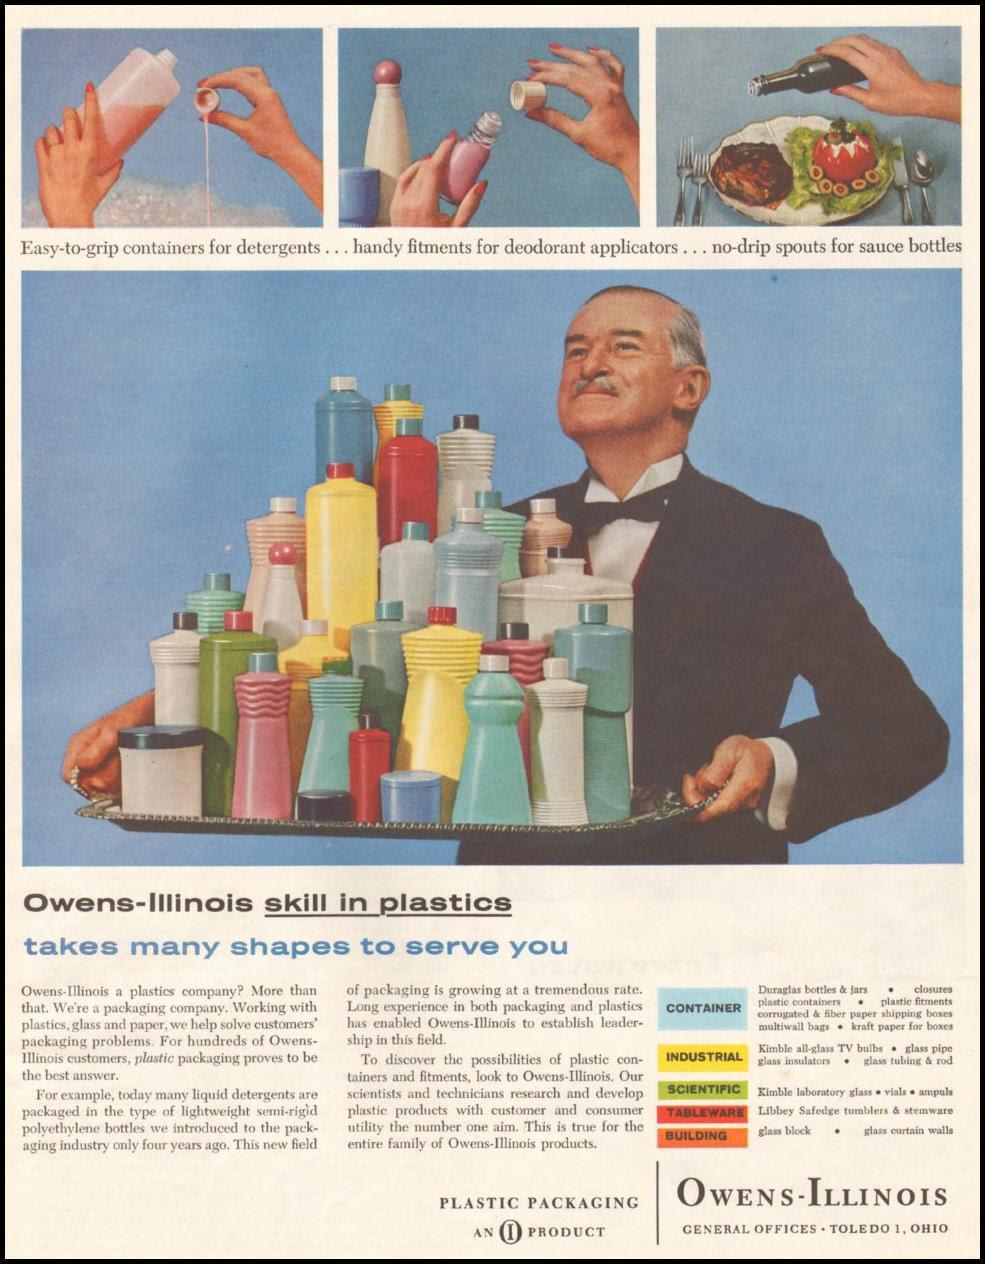 OWENS-ILLINOIS PLASTIC PACKAGING SATURDAY EVENING POST 06/11/1960 p. 109